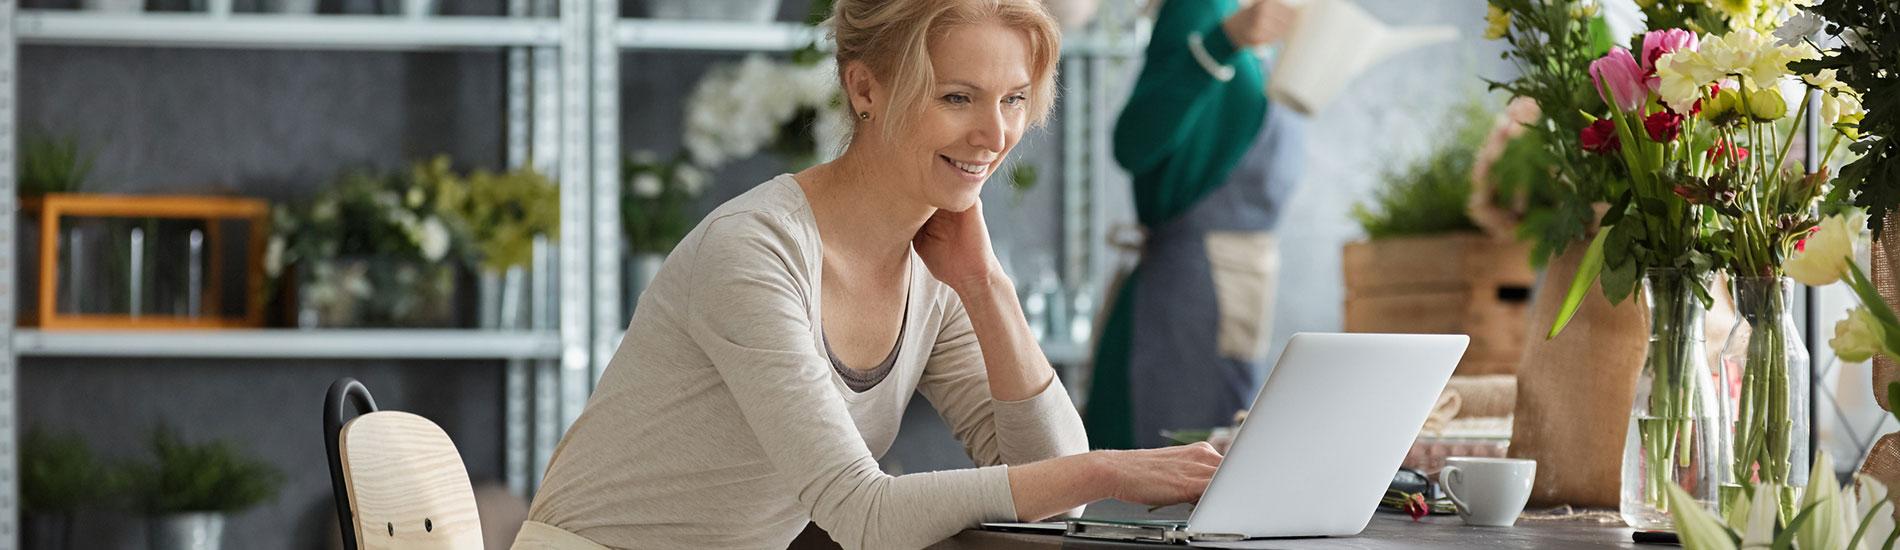 woman sitting at desk looking at laptop screen